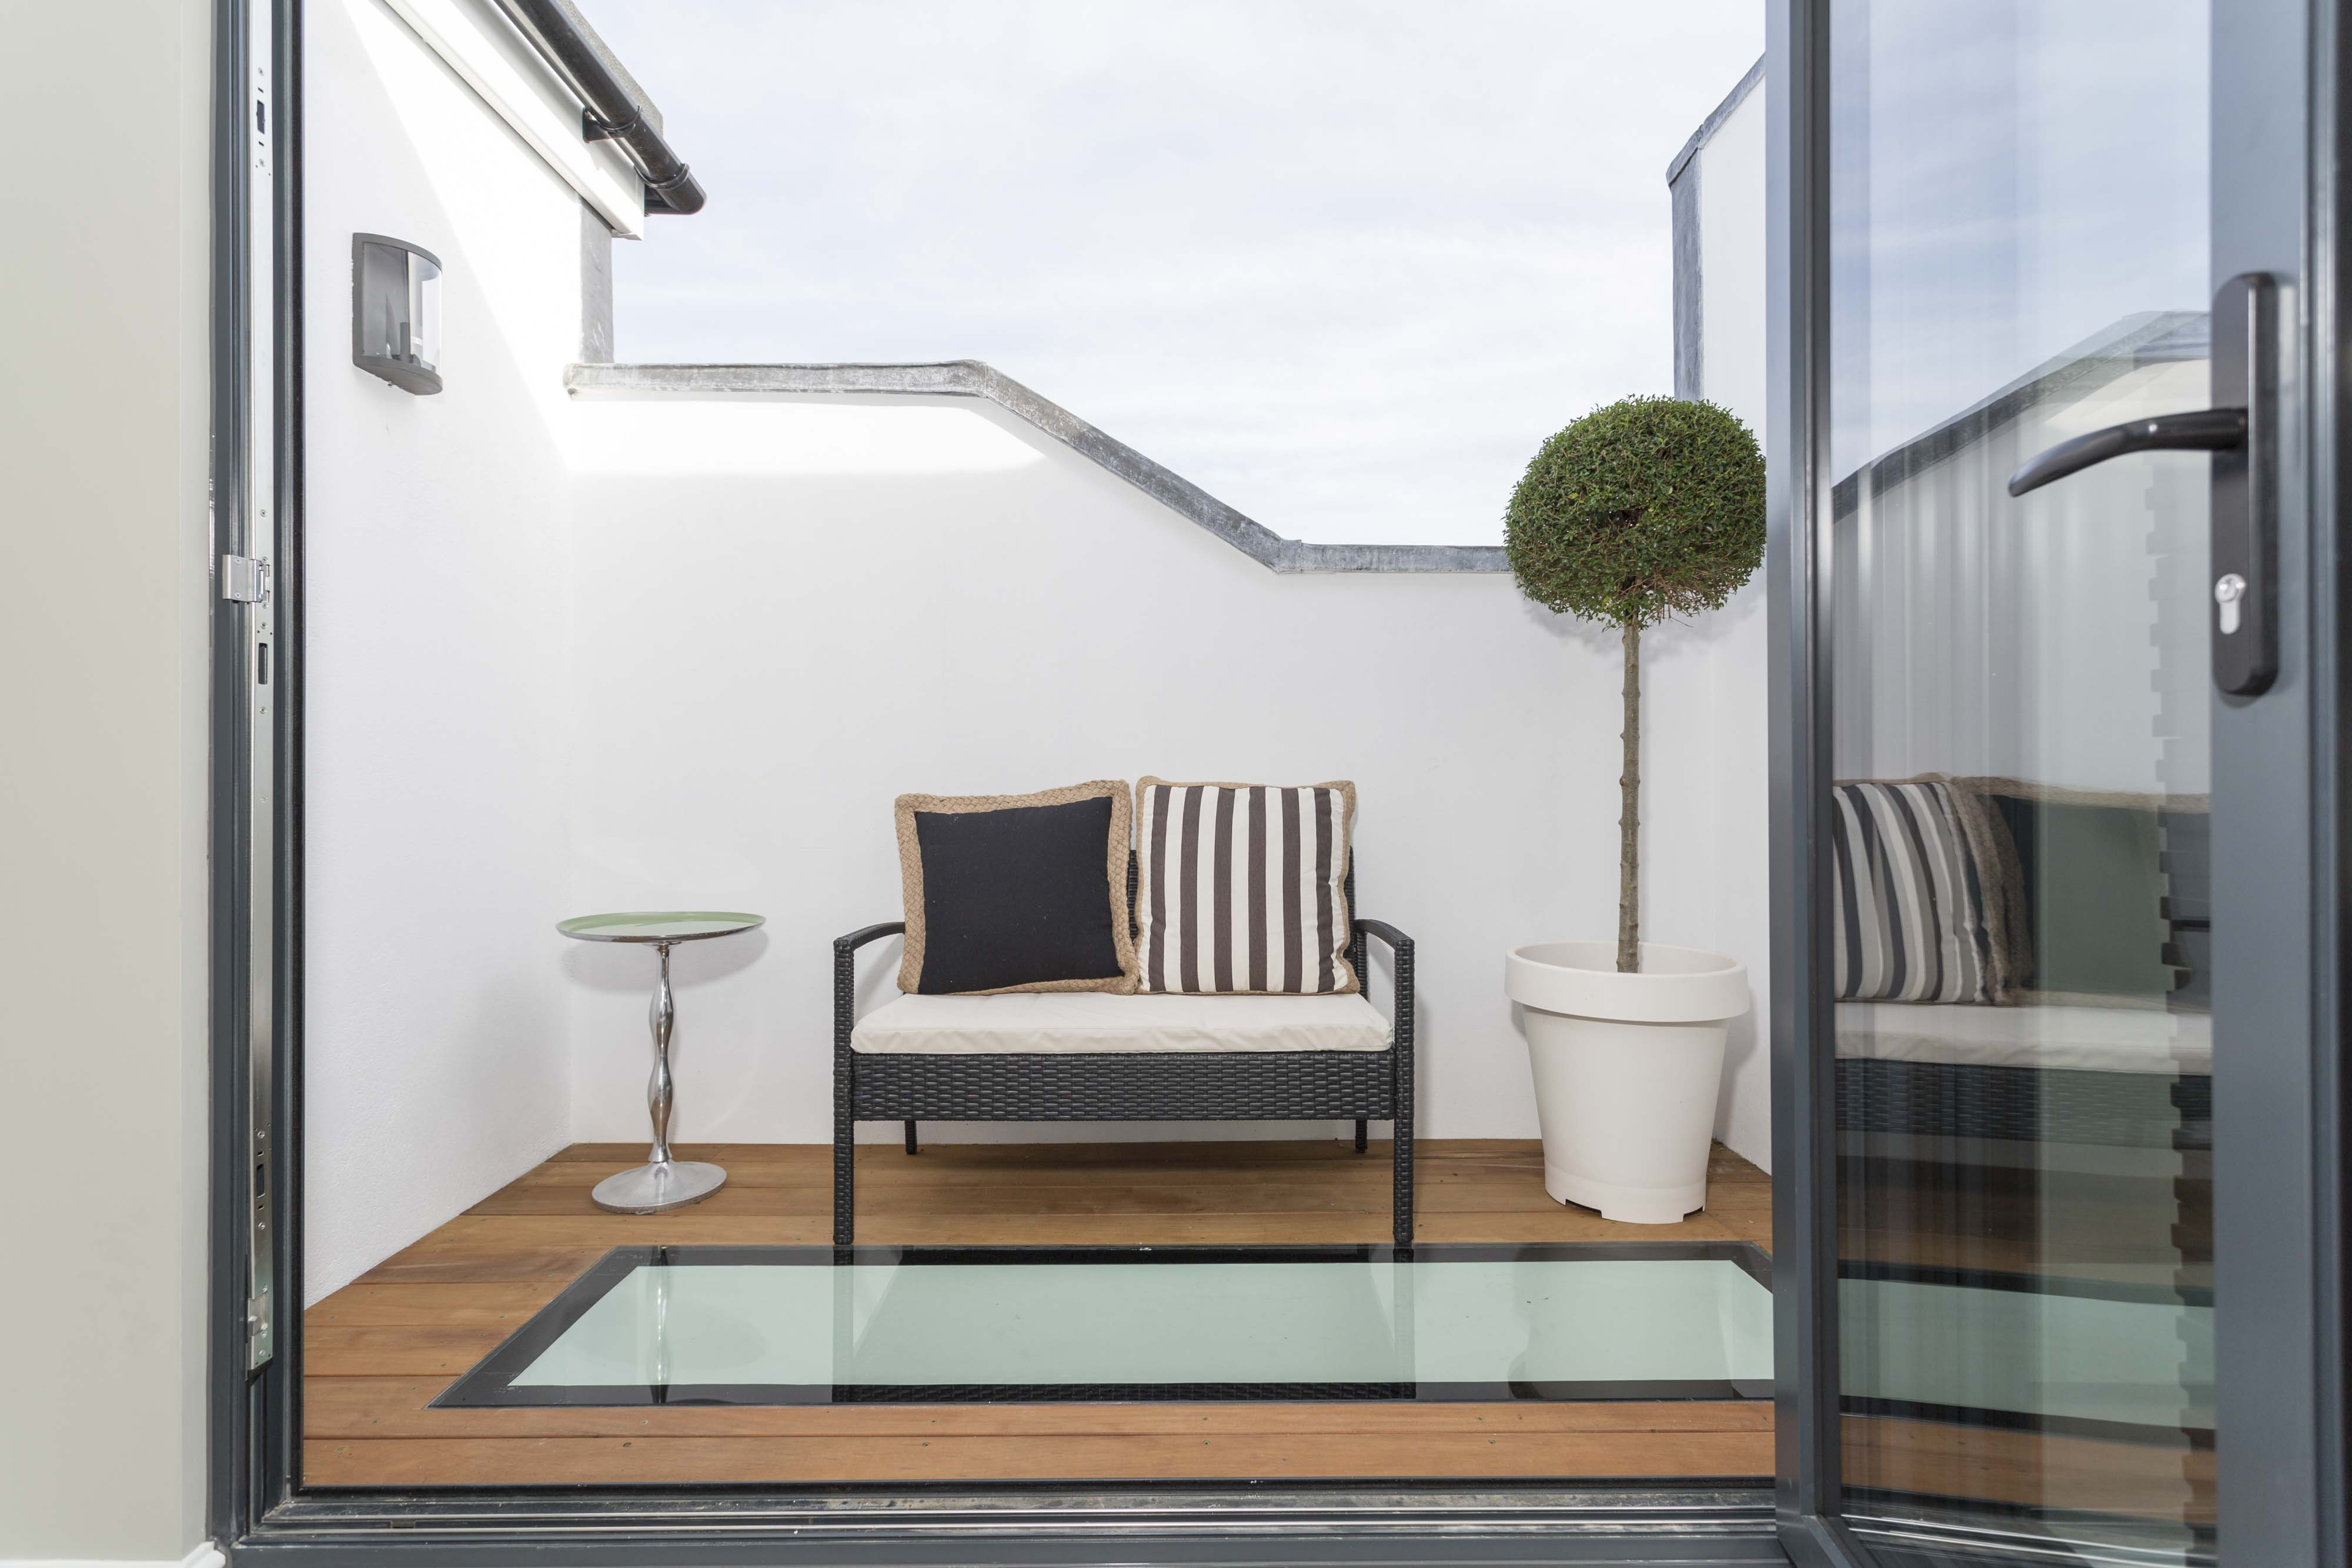 Roof Terrace Conversion London Conversion Roof Terrace